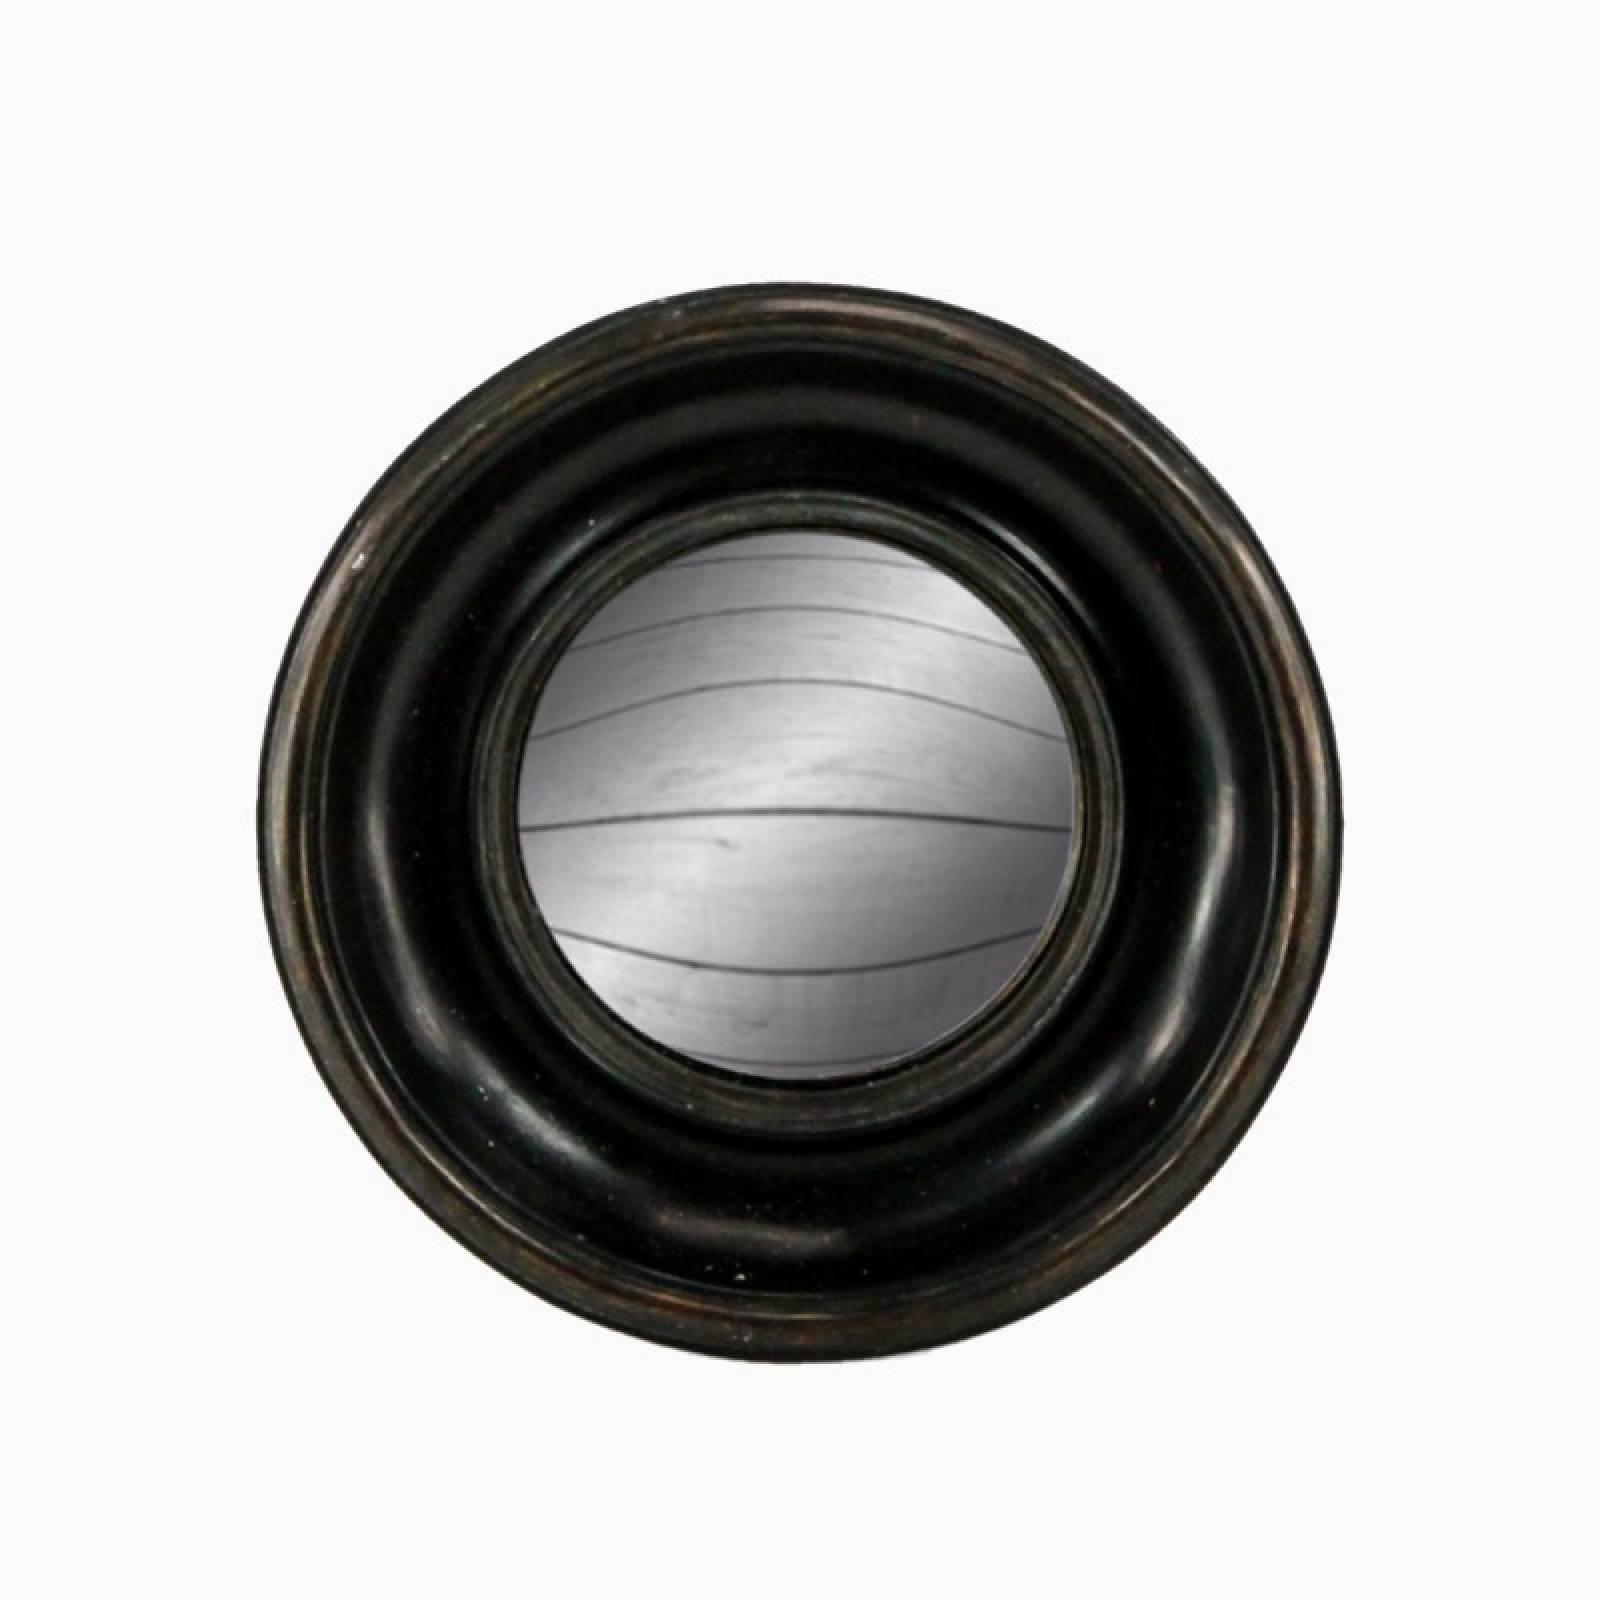 Antiqued Black Deep Framed Small Convex Mirror D:19cm